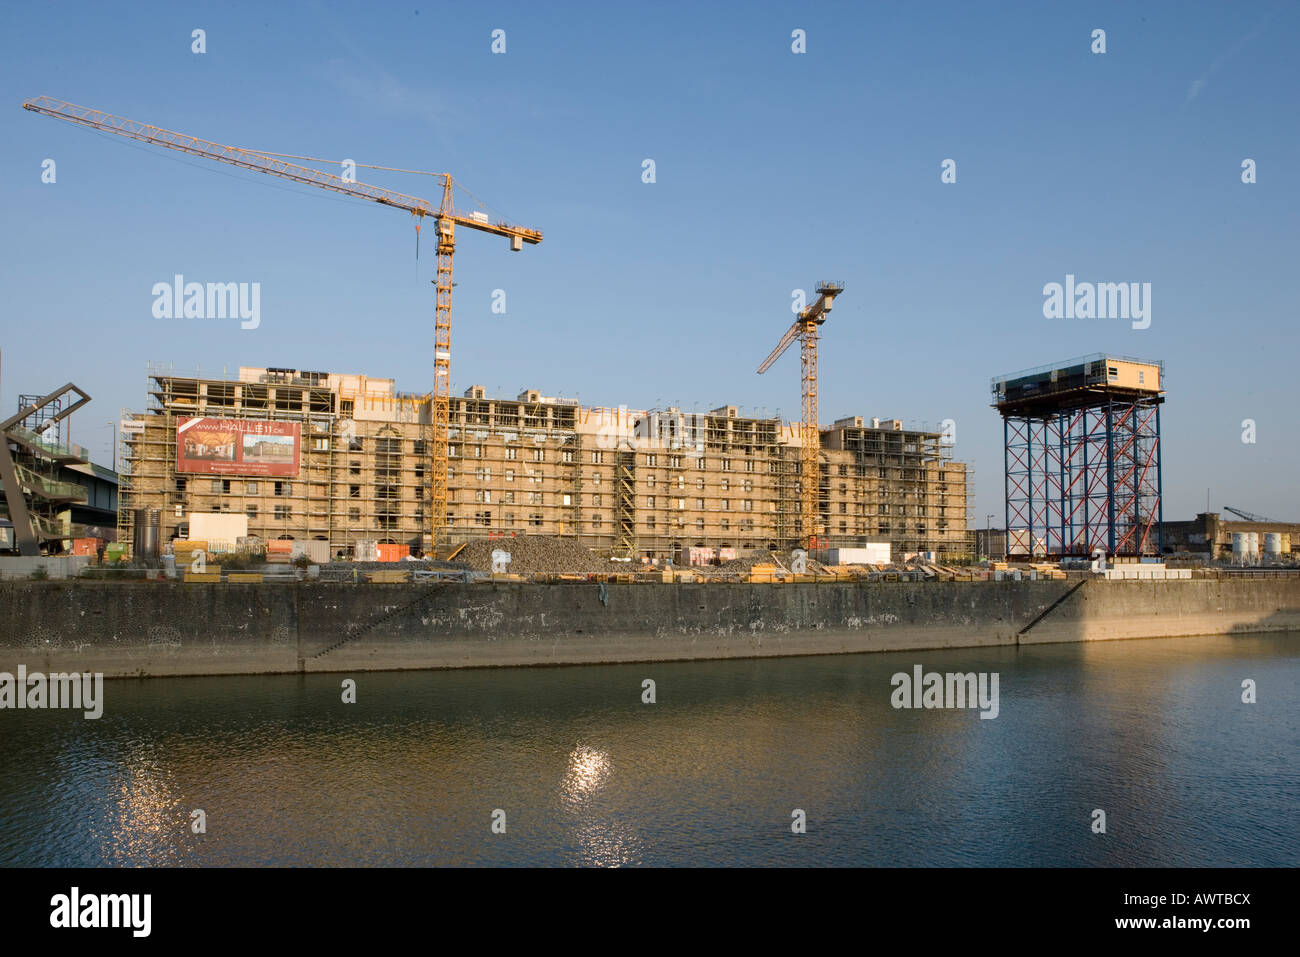 Rheinauhafen Koeln Baustelle Cologne construction site yacht port further storage town Stock Photo